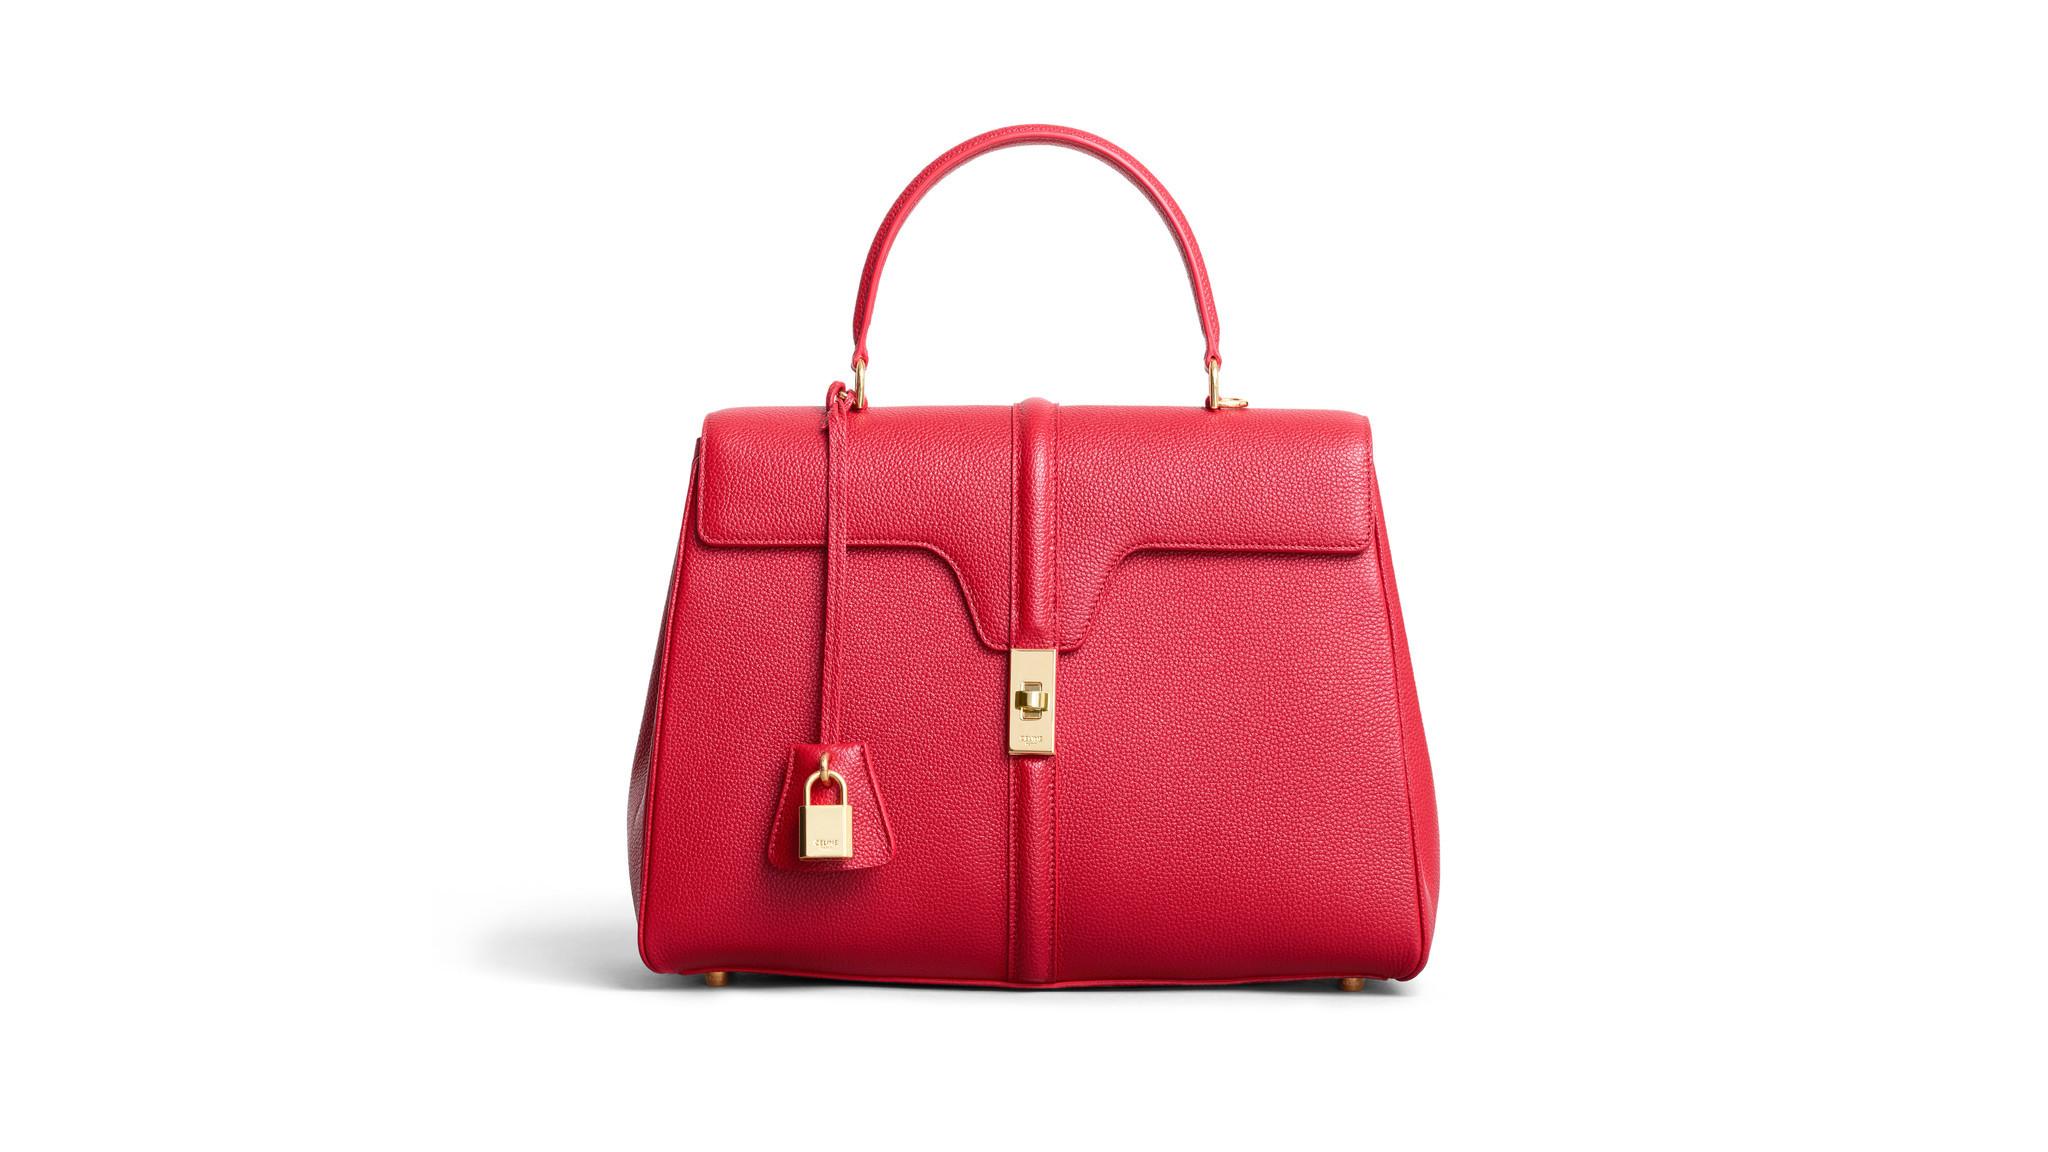 Celine medium 16 handbag in grained calfskin with removable shoulder strap, brass twistlock closure